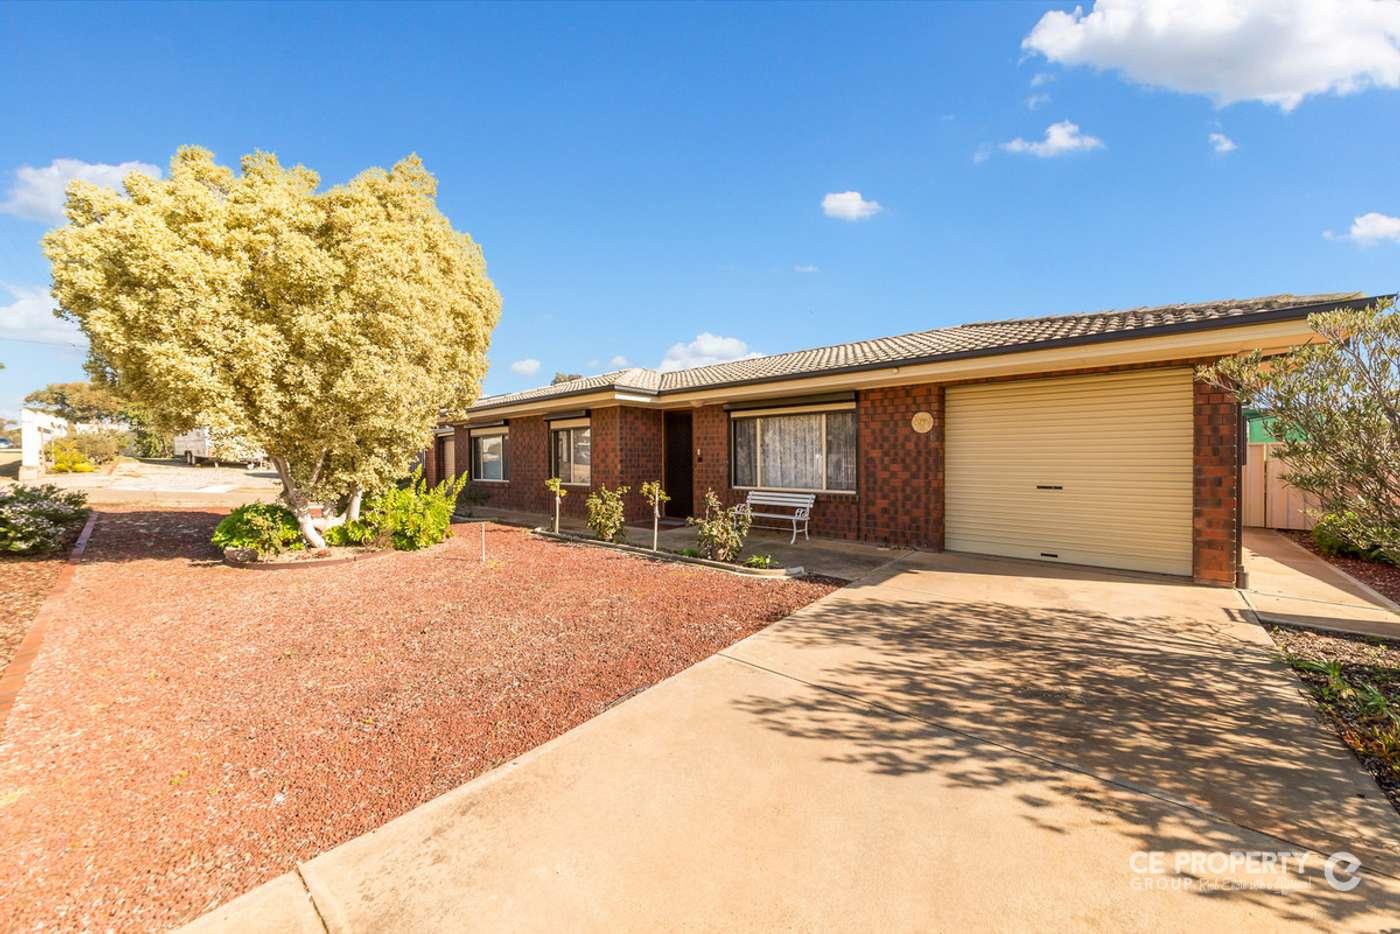 Main view of Homely house listing, 41 Berryman Avenue, Mannum SA 5238